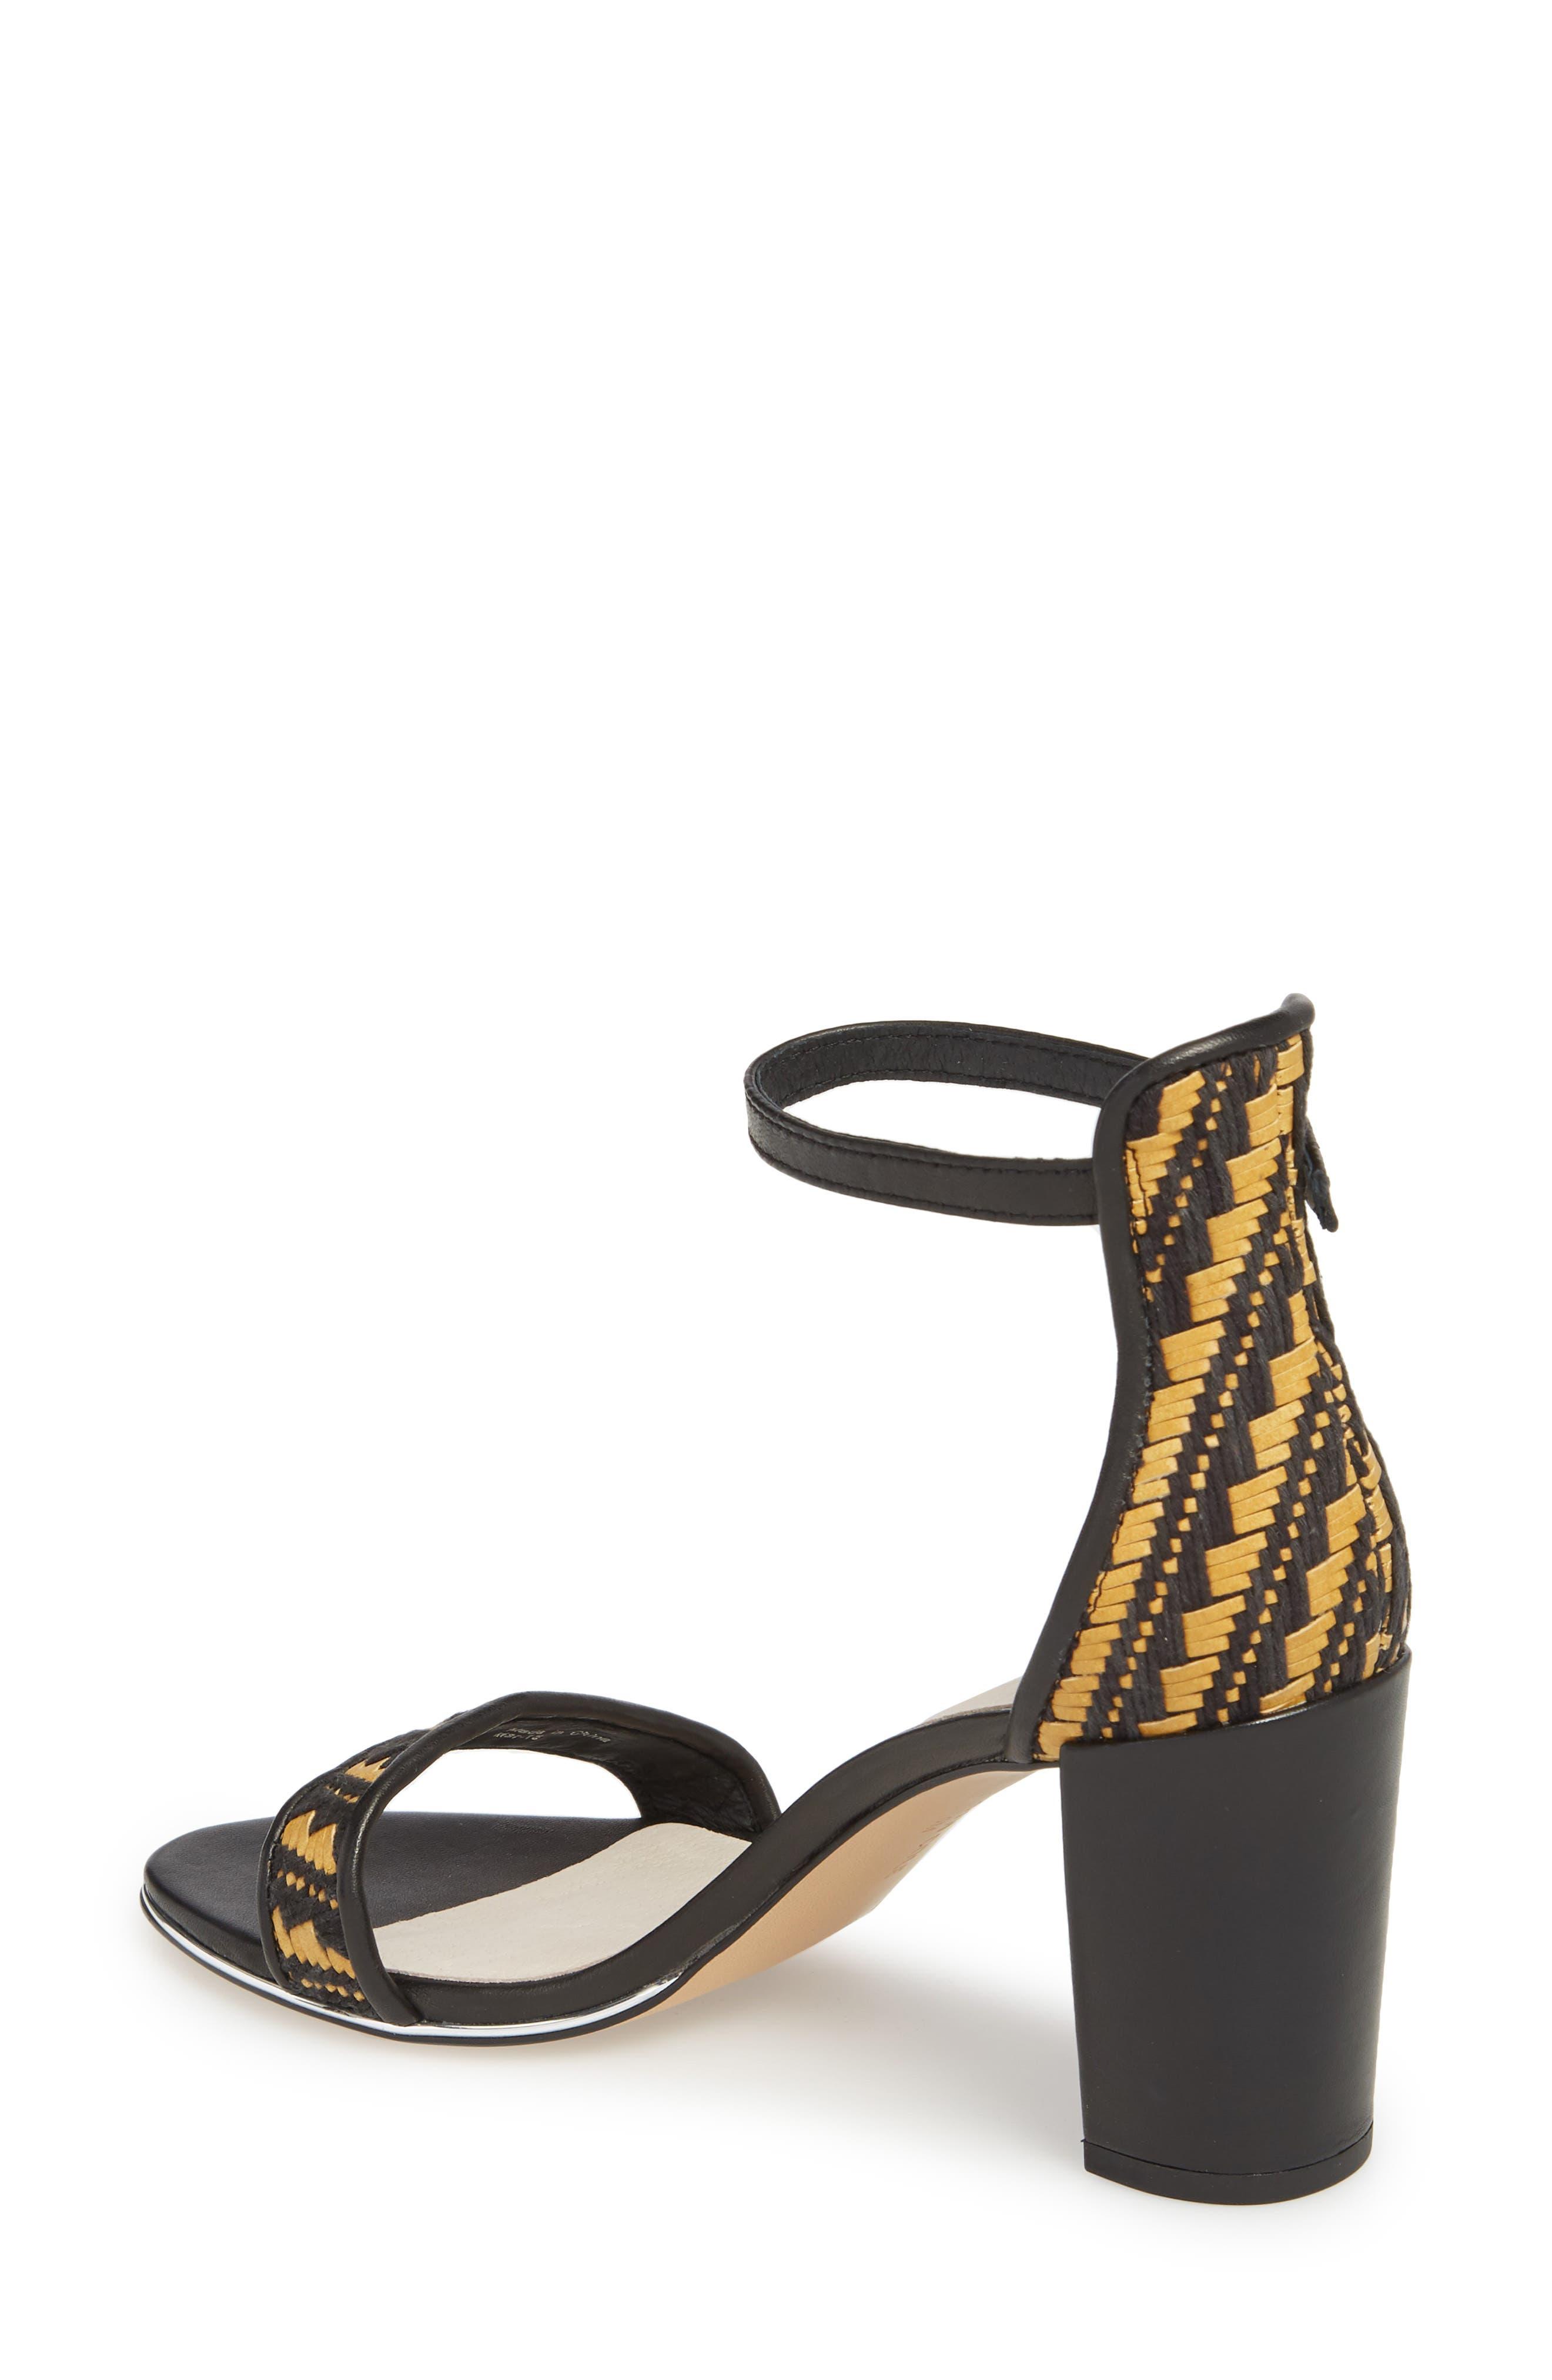 'Lex' Ankle Strap Sandal,                             Alternate thumbnail 2, color,                             004